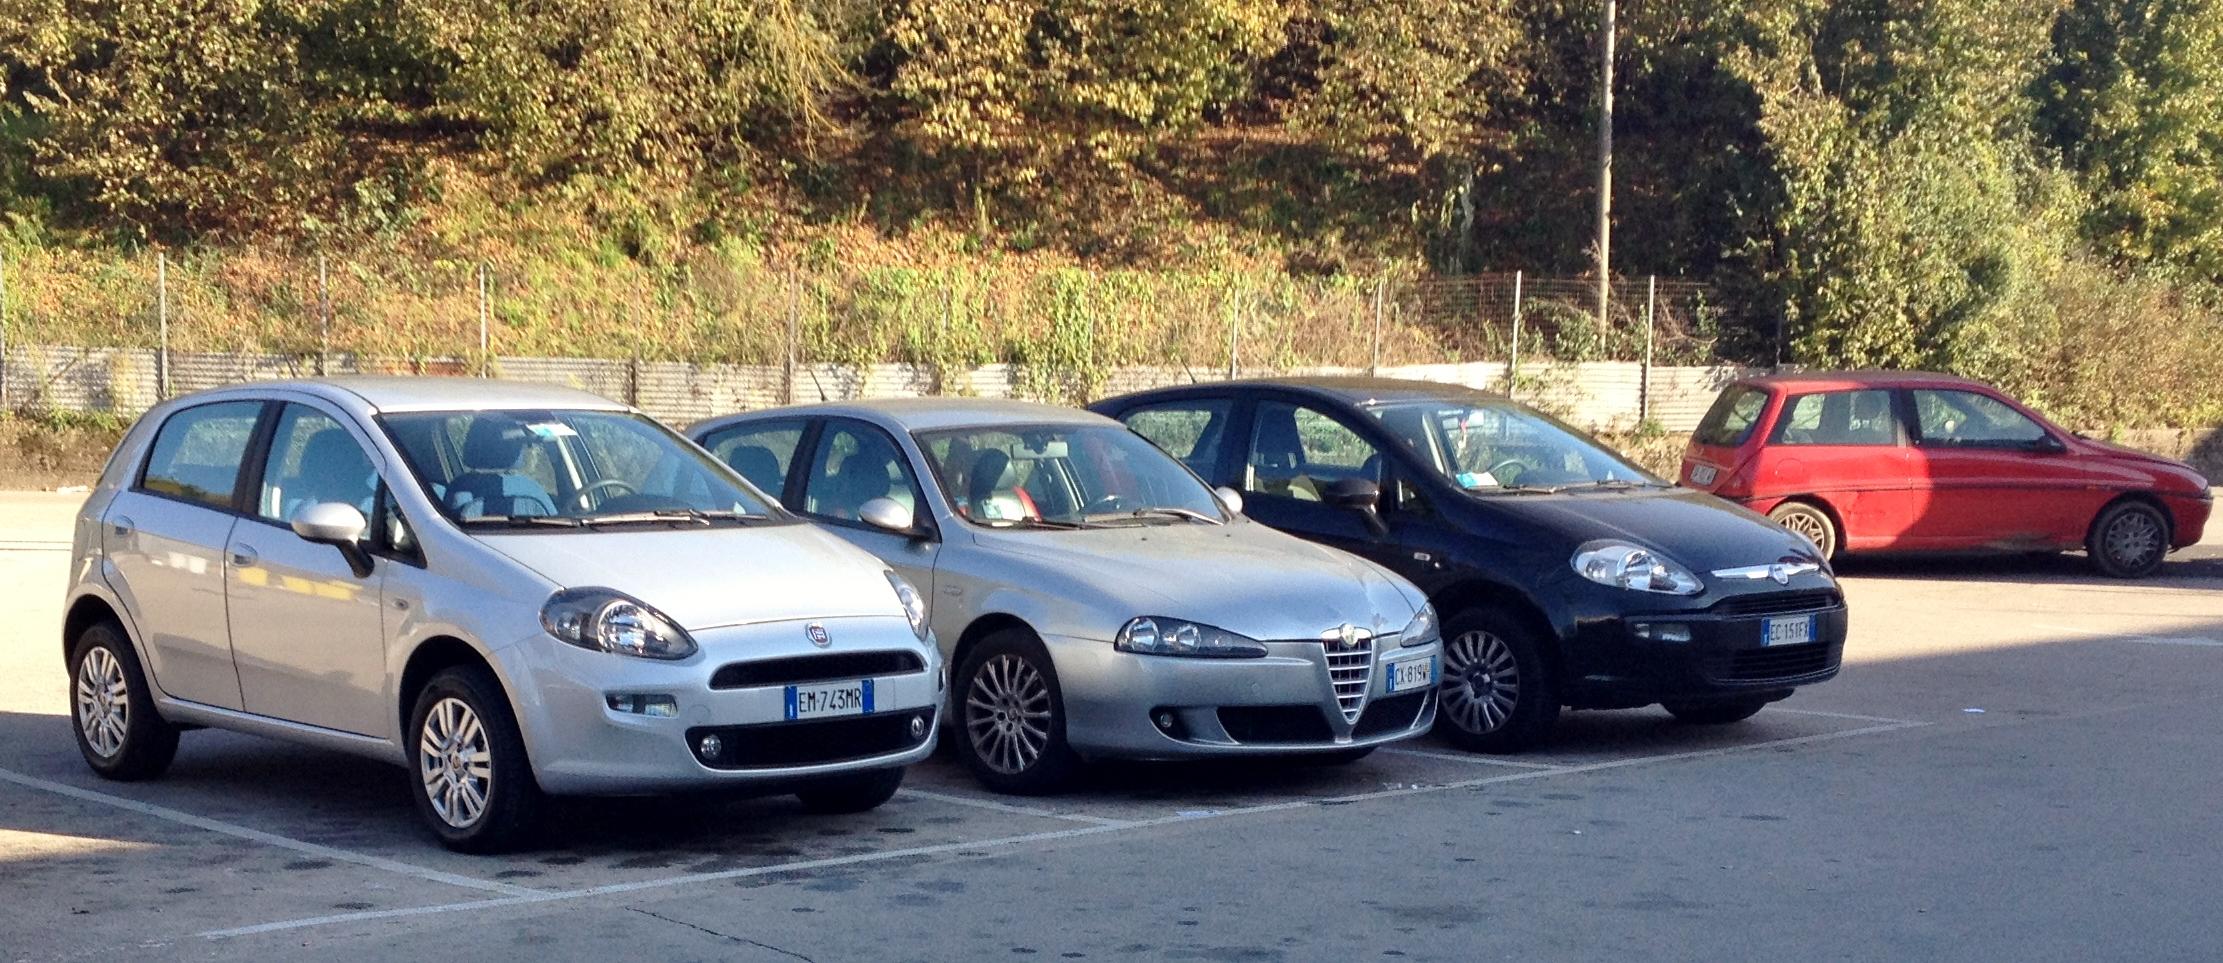 Alfa Romeo Wiki >> File:Fiat Punto 2012, Alfa Romeo 147, Fiat Punto Evo, Lancia Y.JPG - Wikimedia Commons